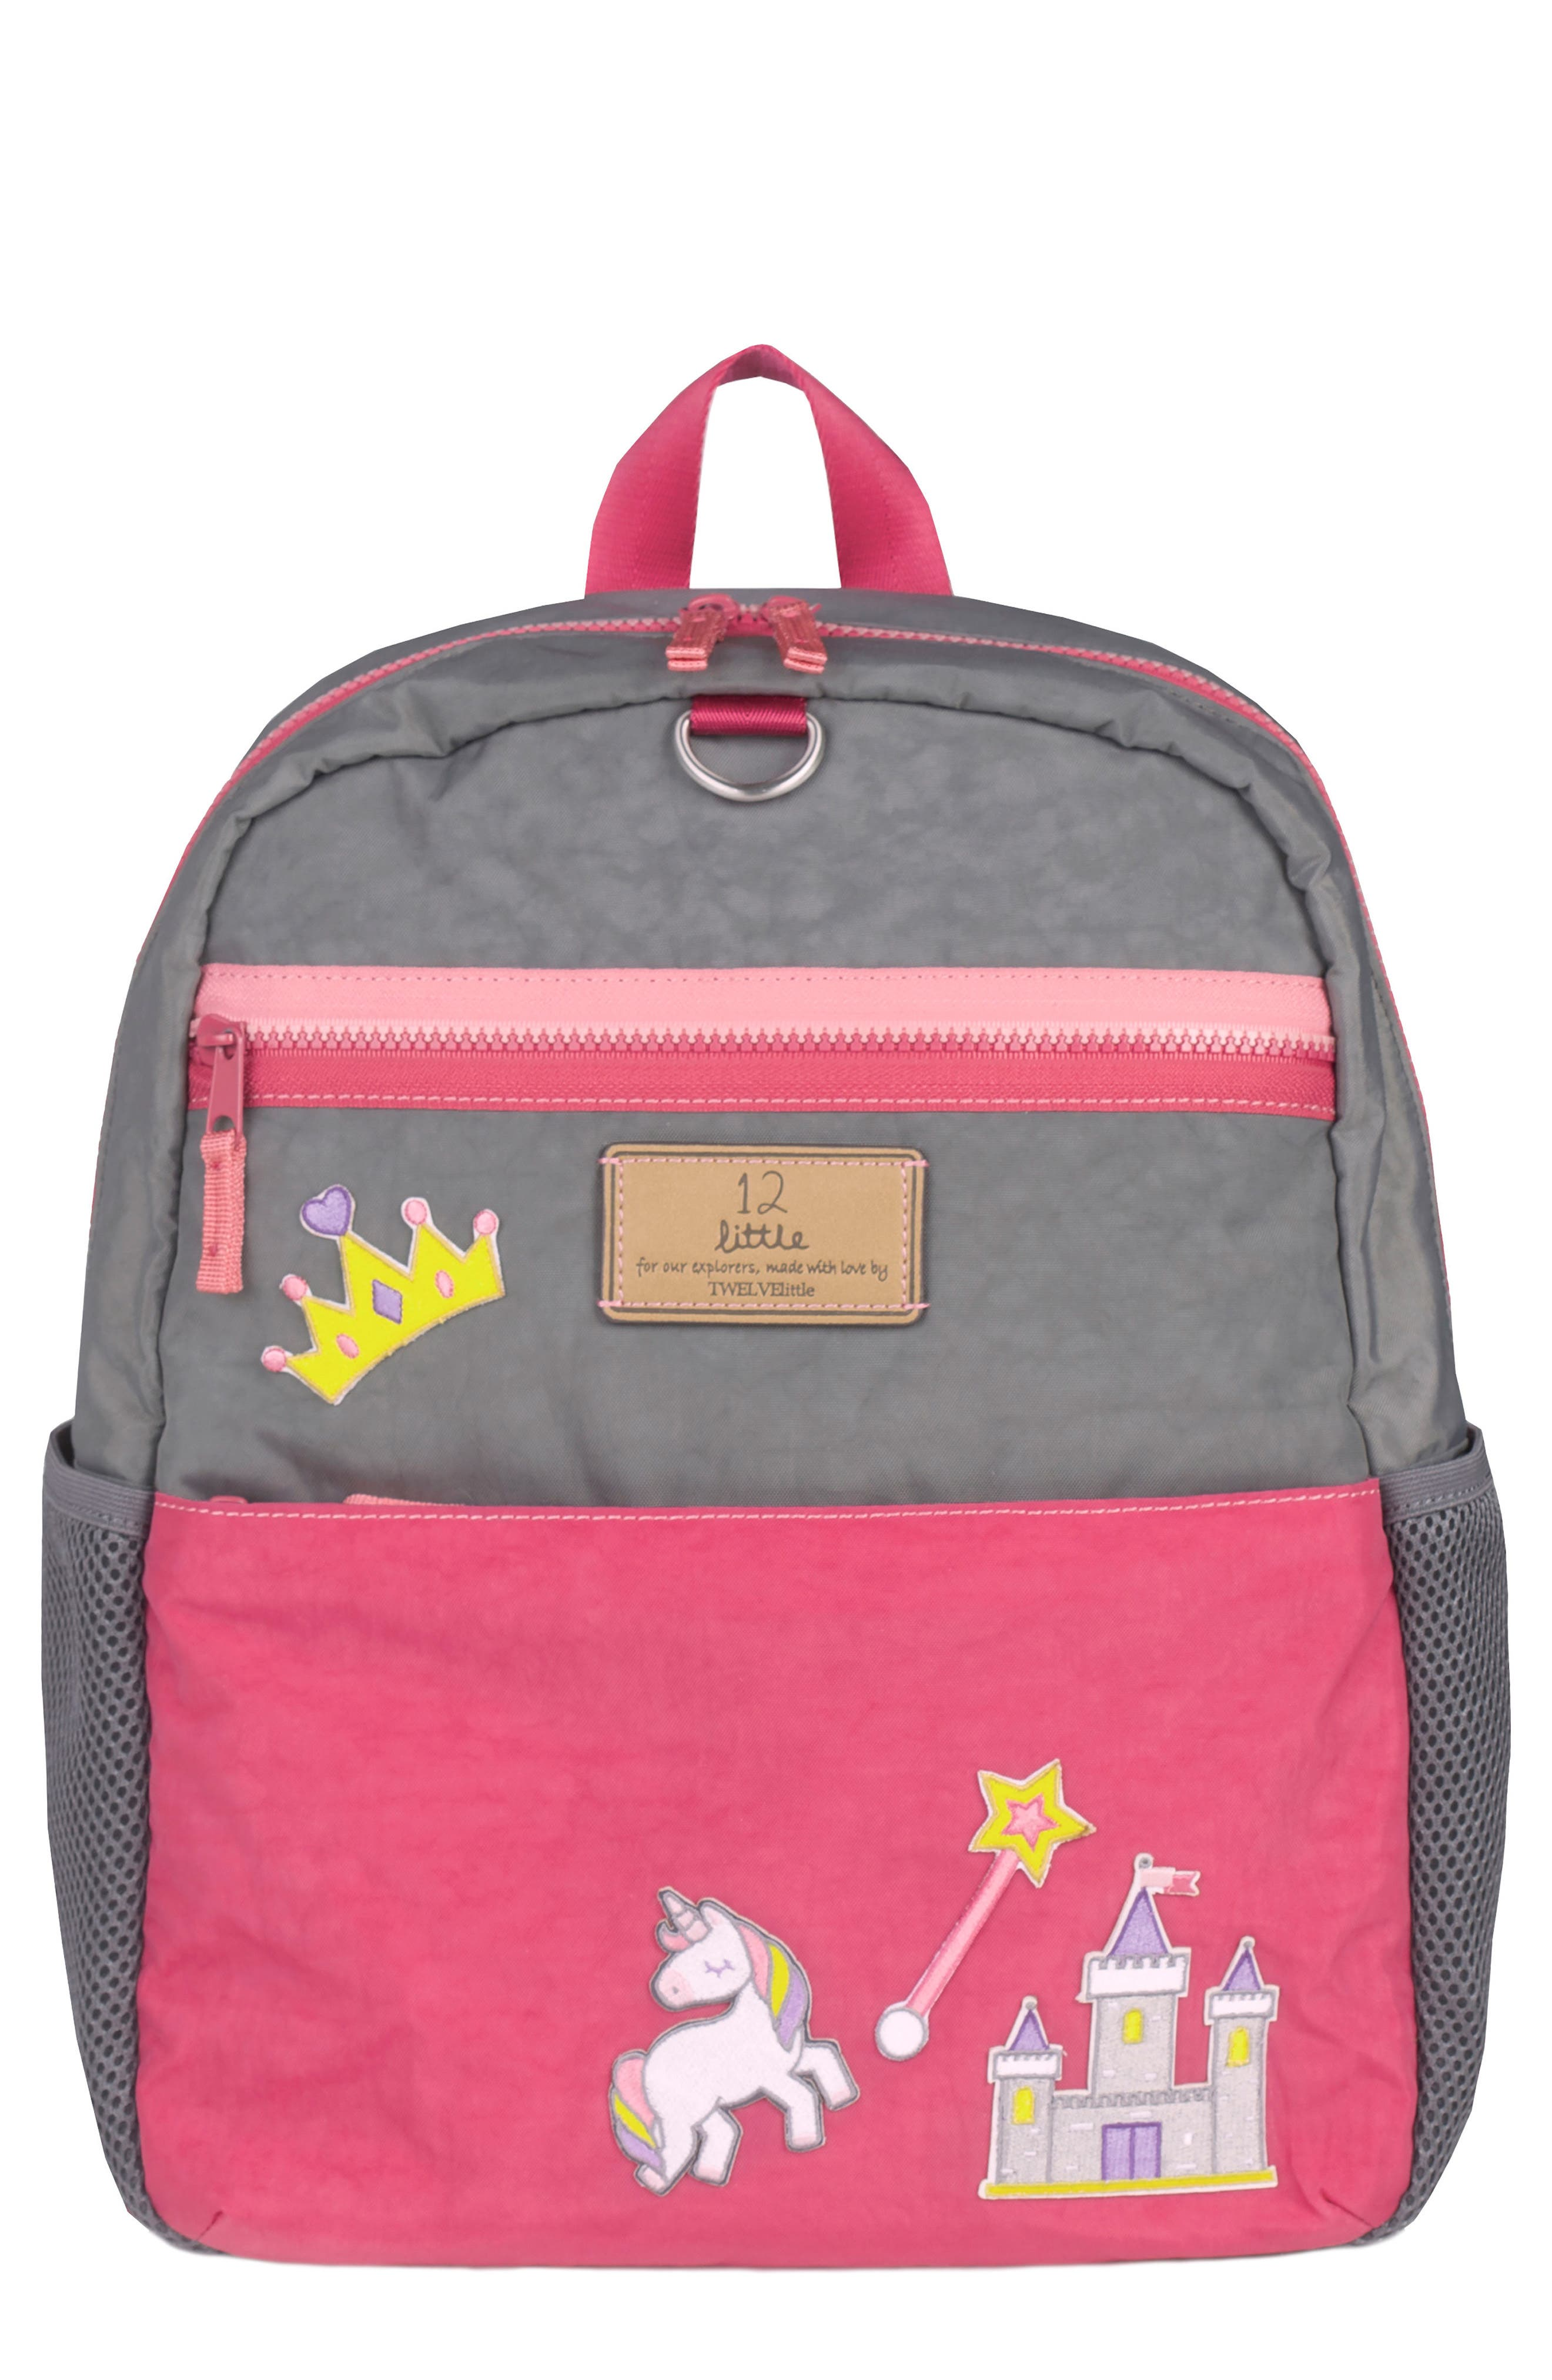 Alternate Image 1 Selected - TWELVElittle Courage Backpack (Kids)